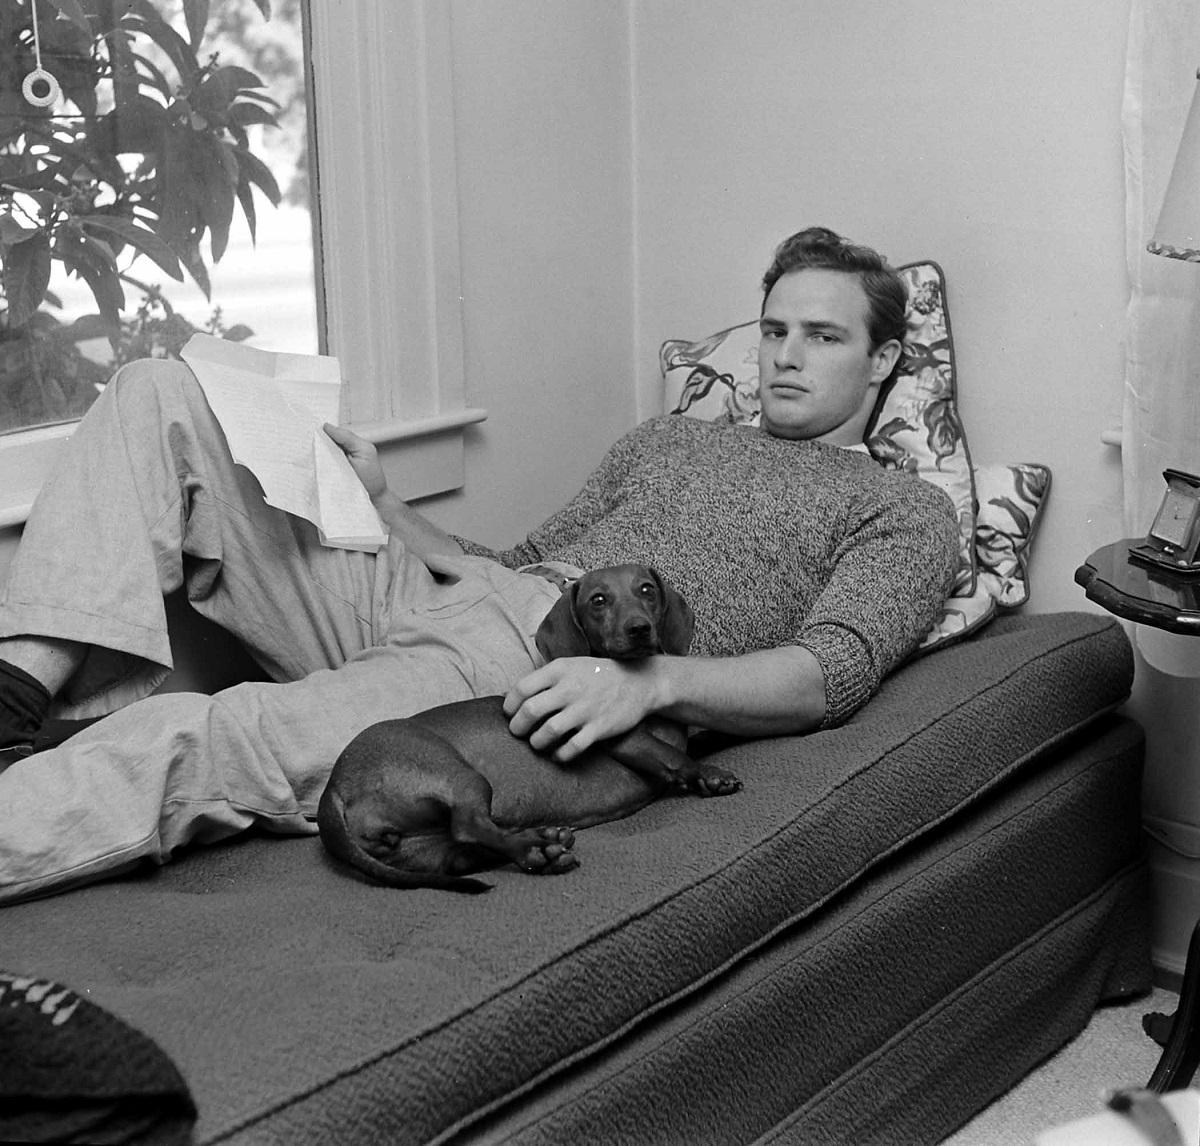 Marlon Brando with his dog in 1949